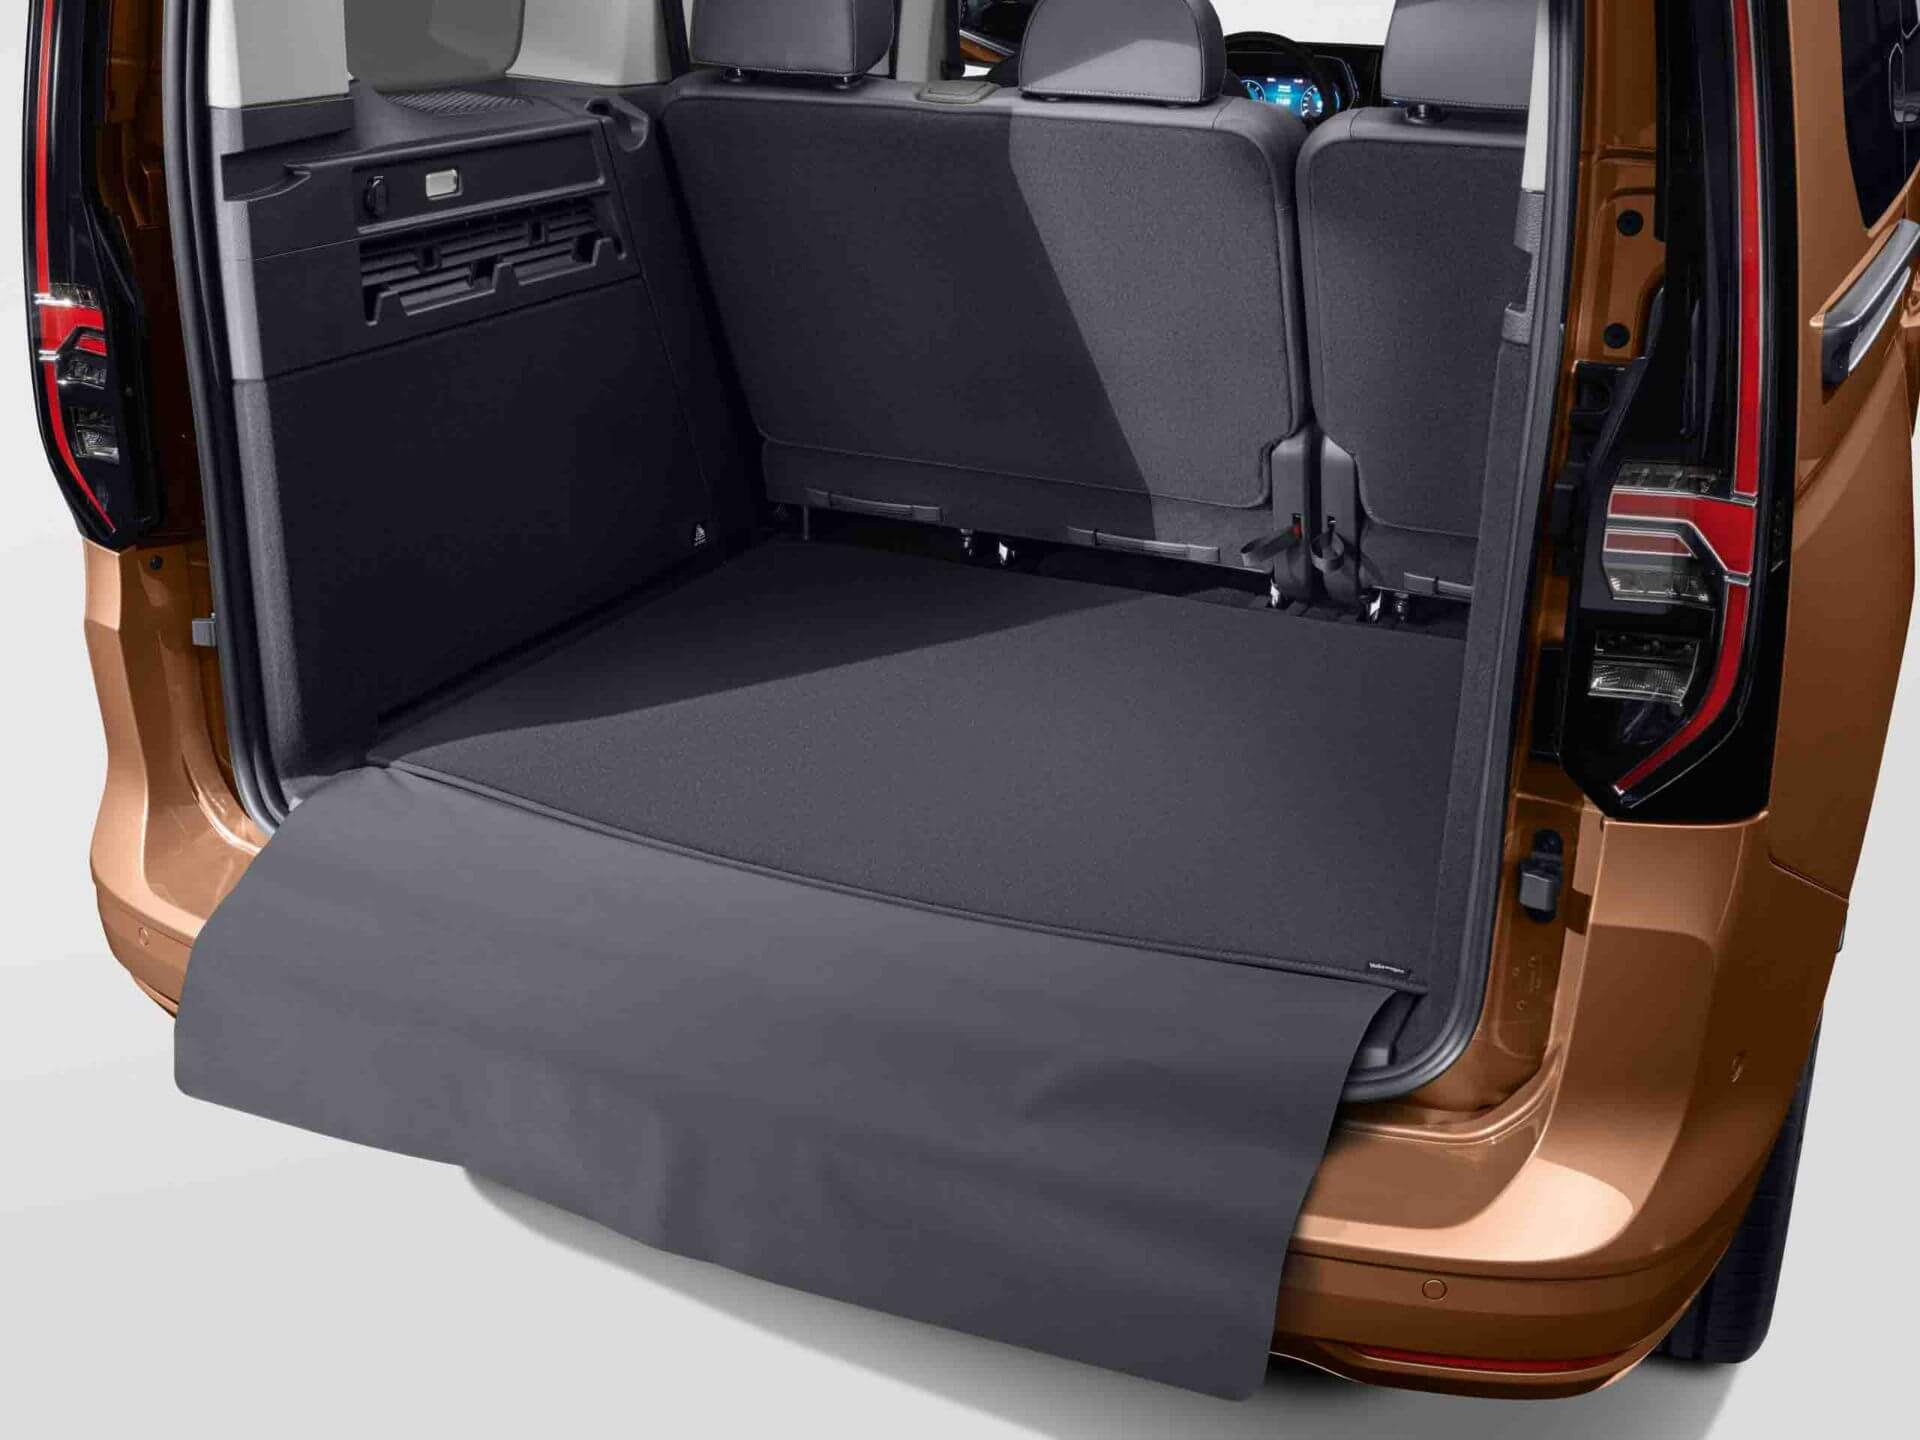 Luggage reversible floor covering